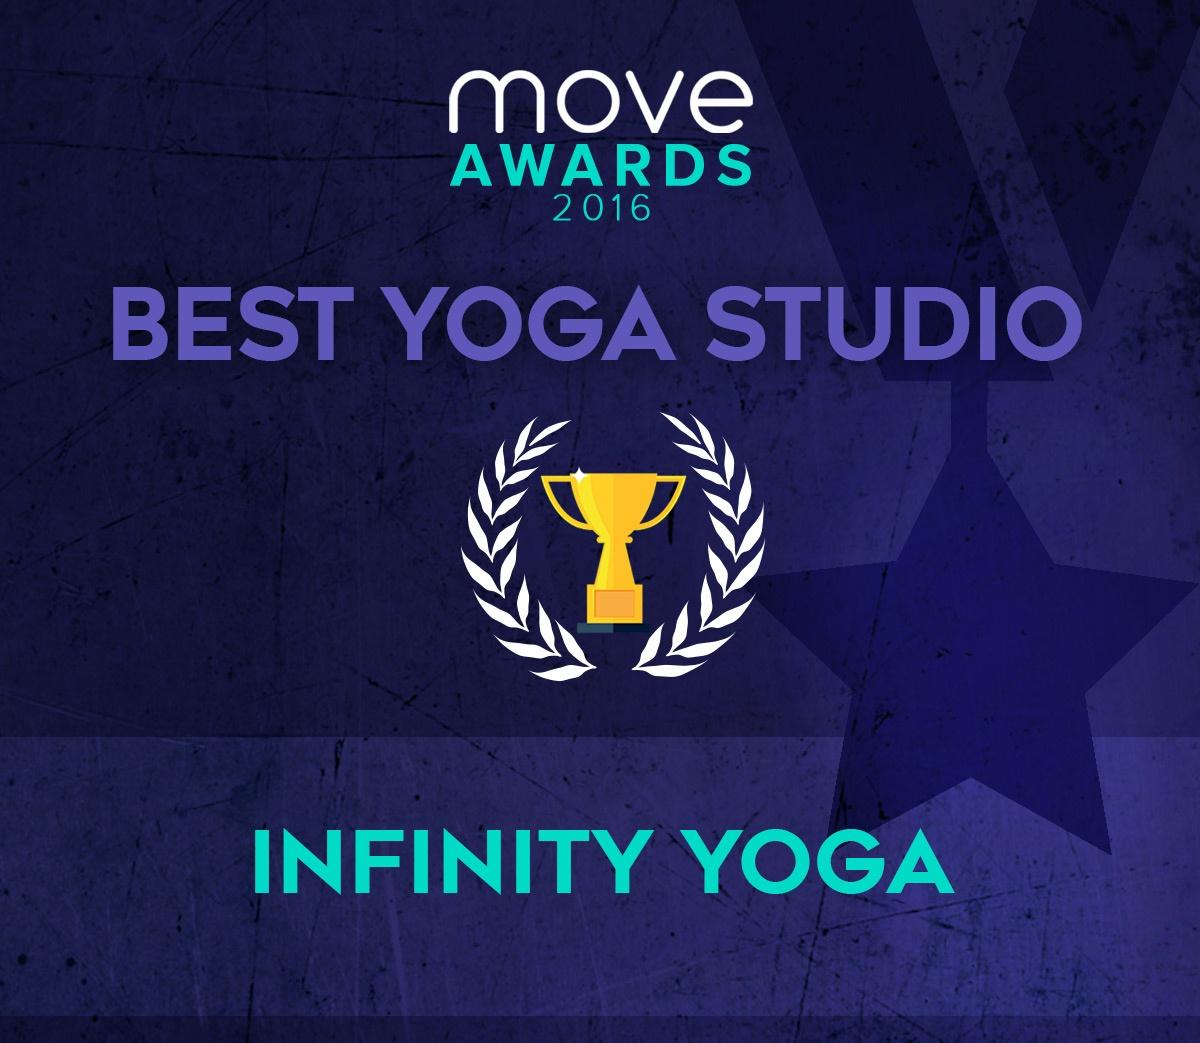 Best-Yoga-Studio-Glasgow.jpg